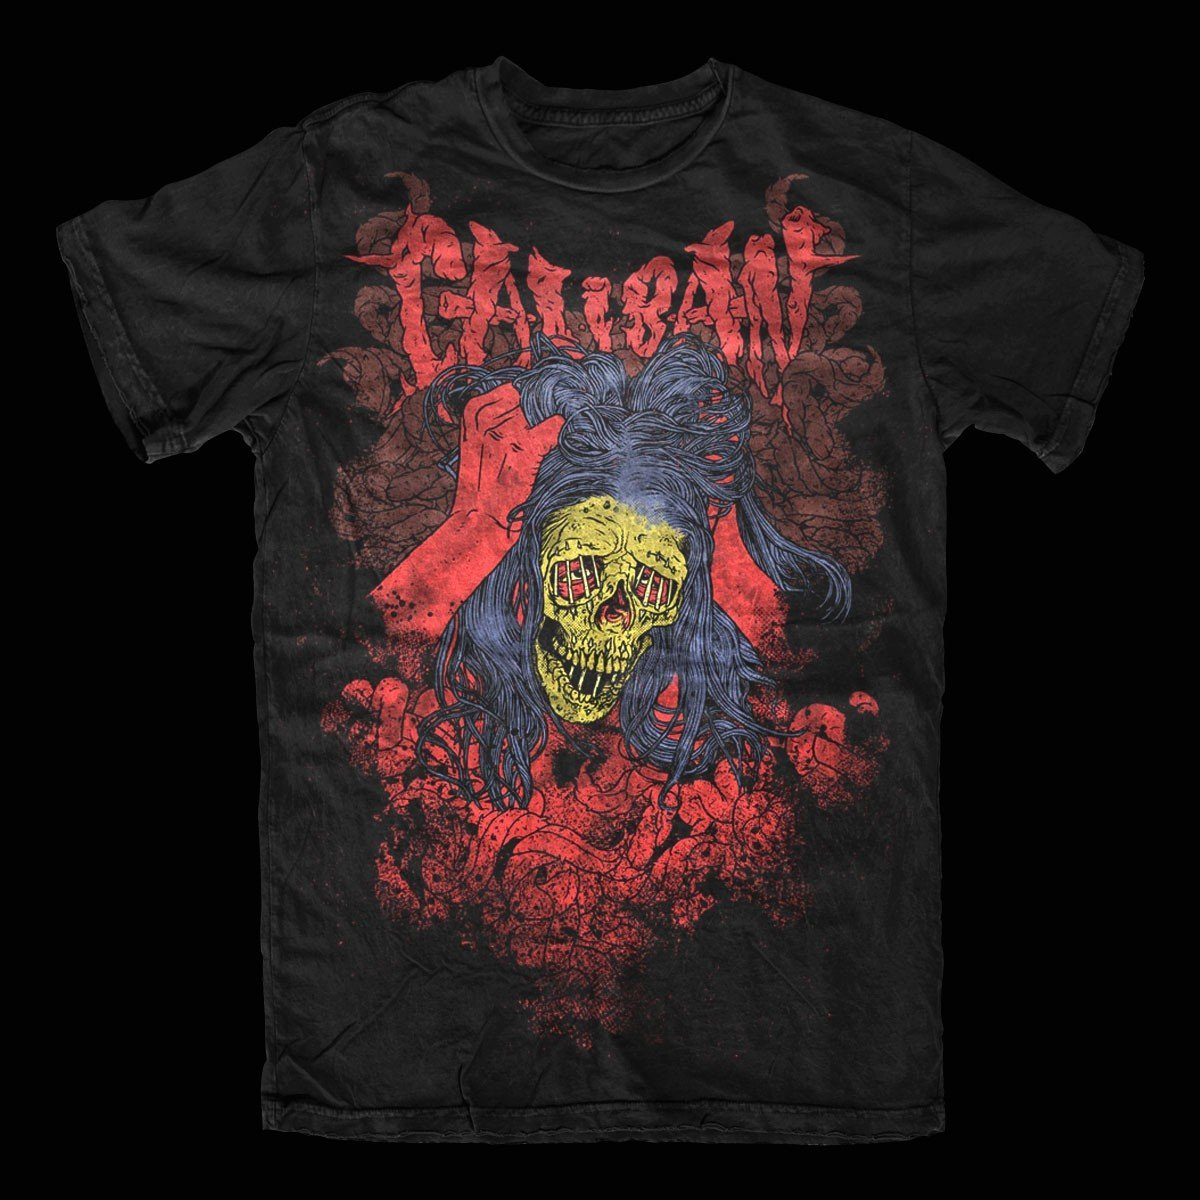 Caliban – Skull T-Shirt Design